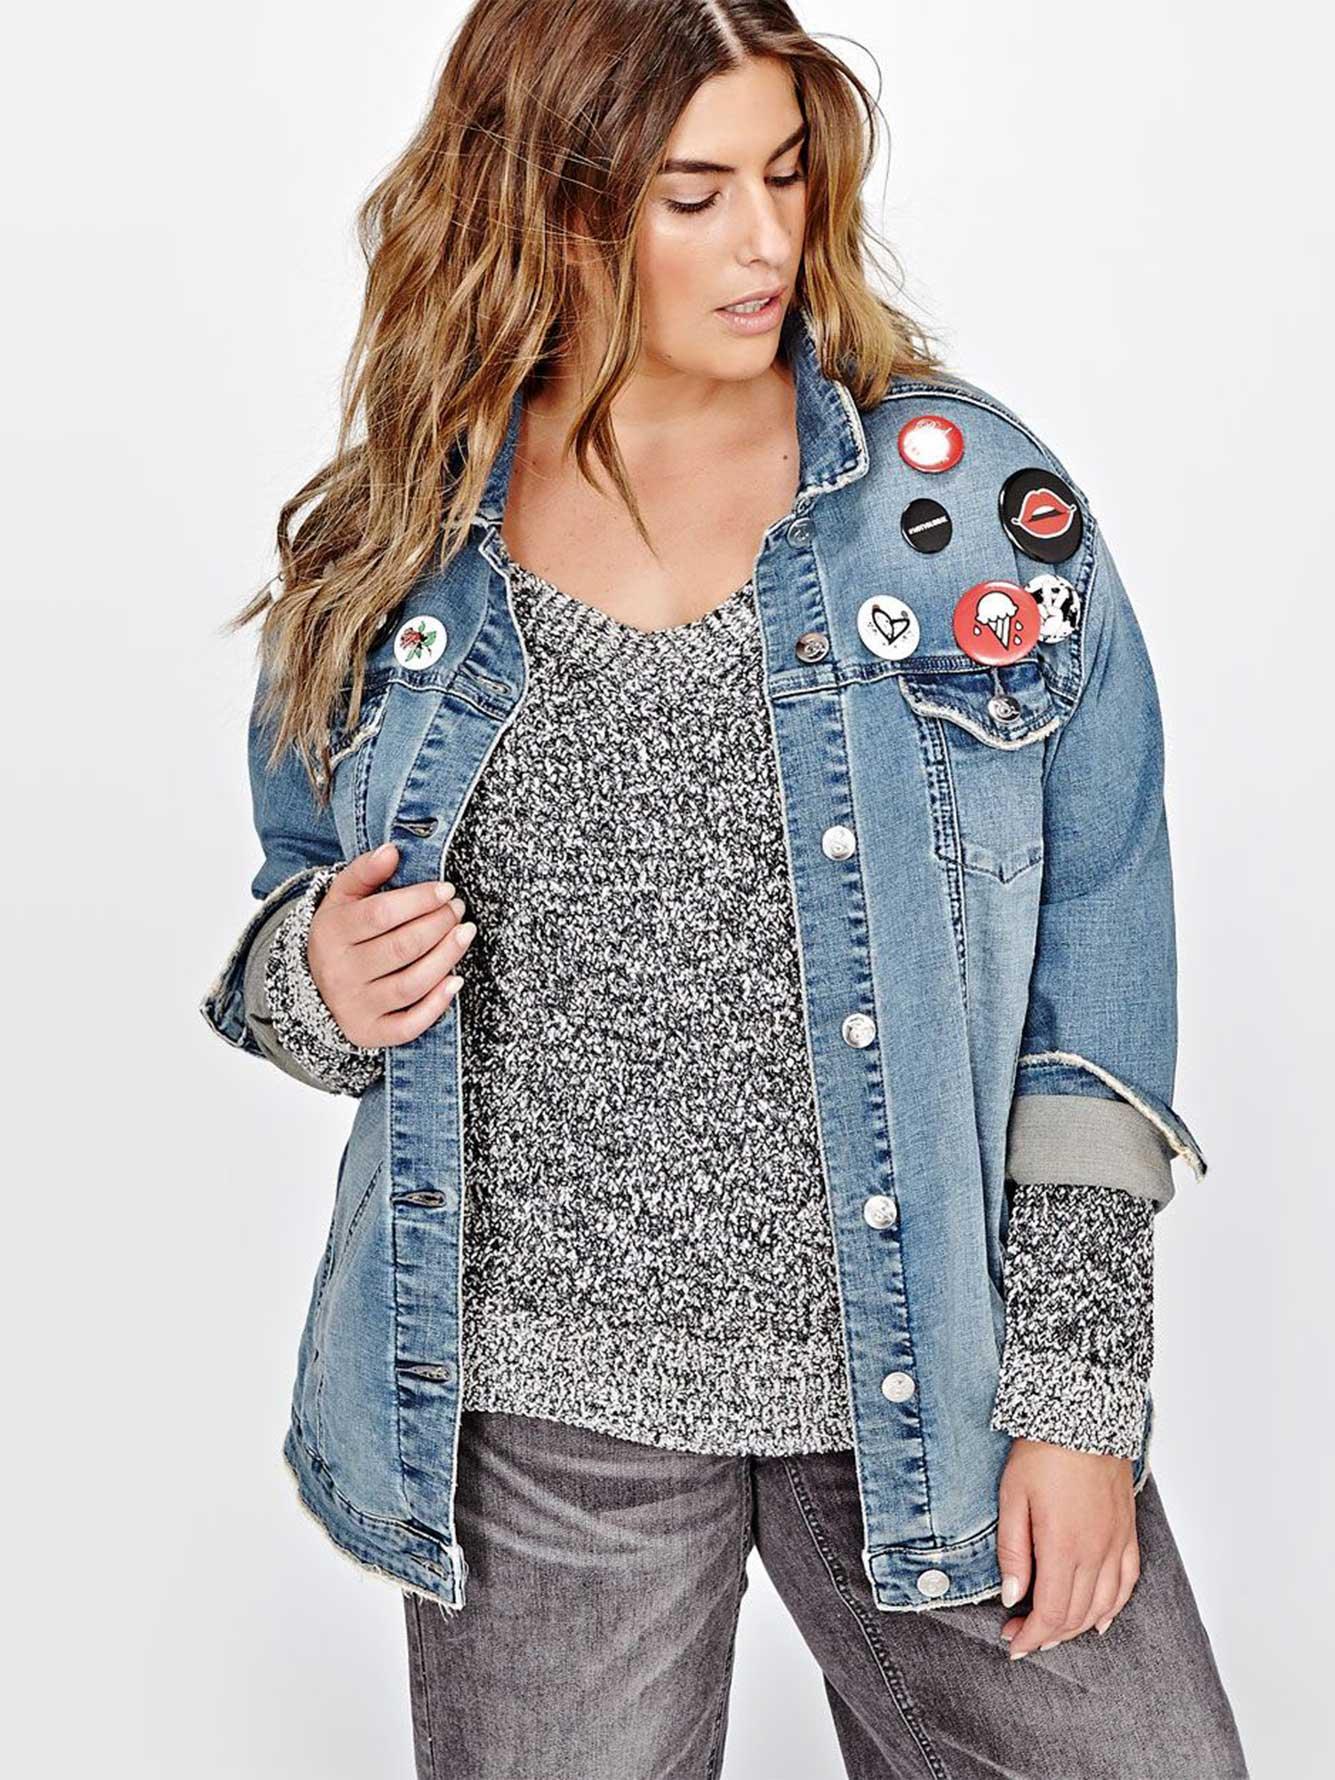 605ca6615e1c4 L L Embellished Boyfriend Denim Jacket with Pin Buttons